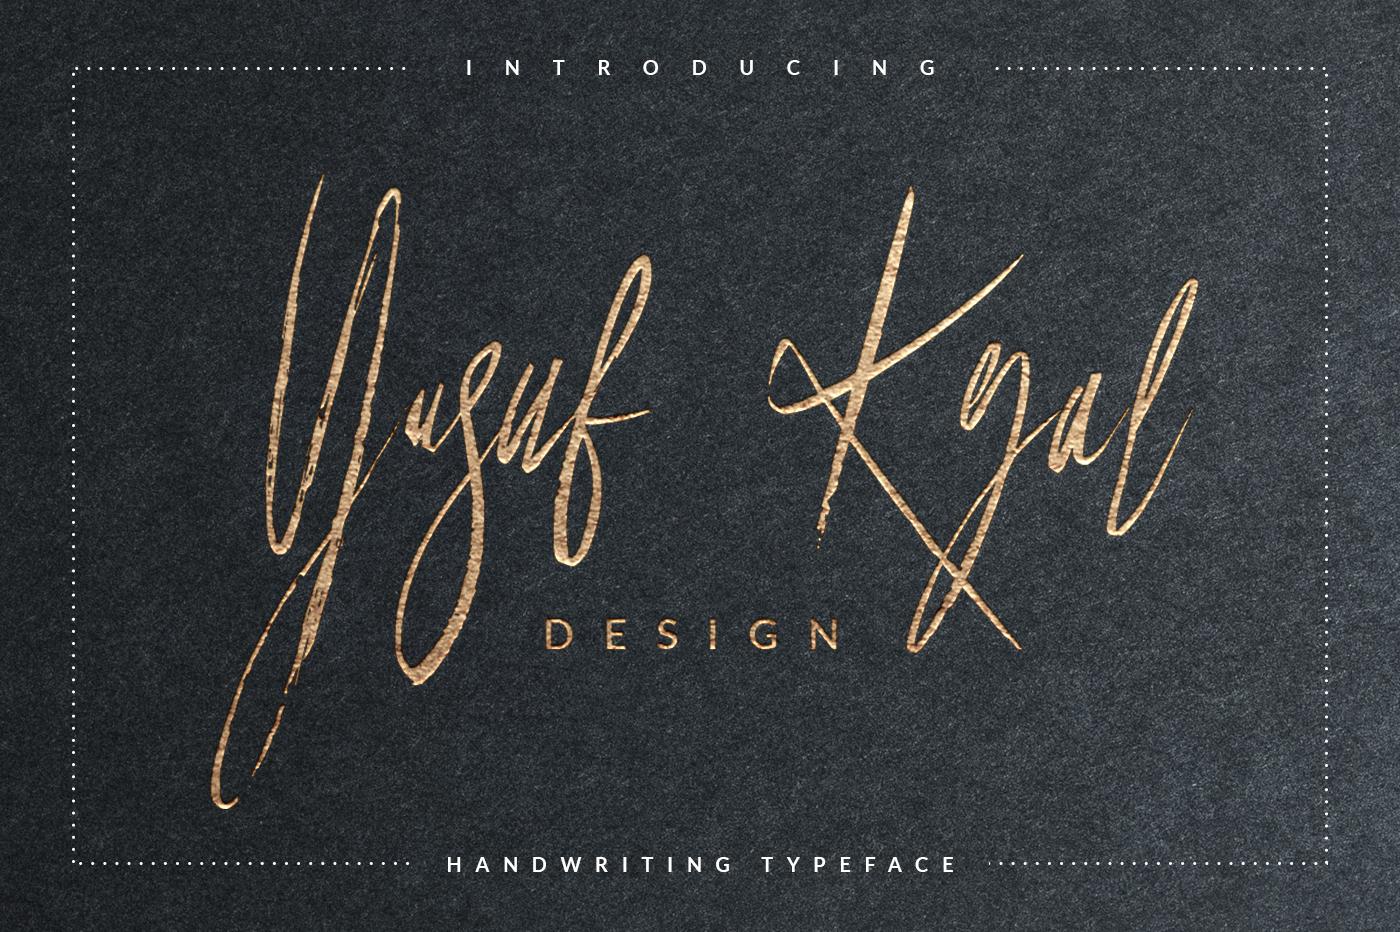 Yusuf Kral Art Font example image 1